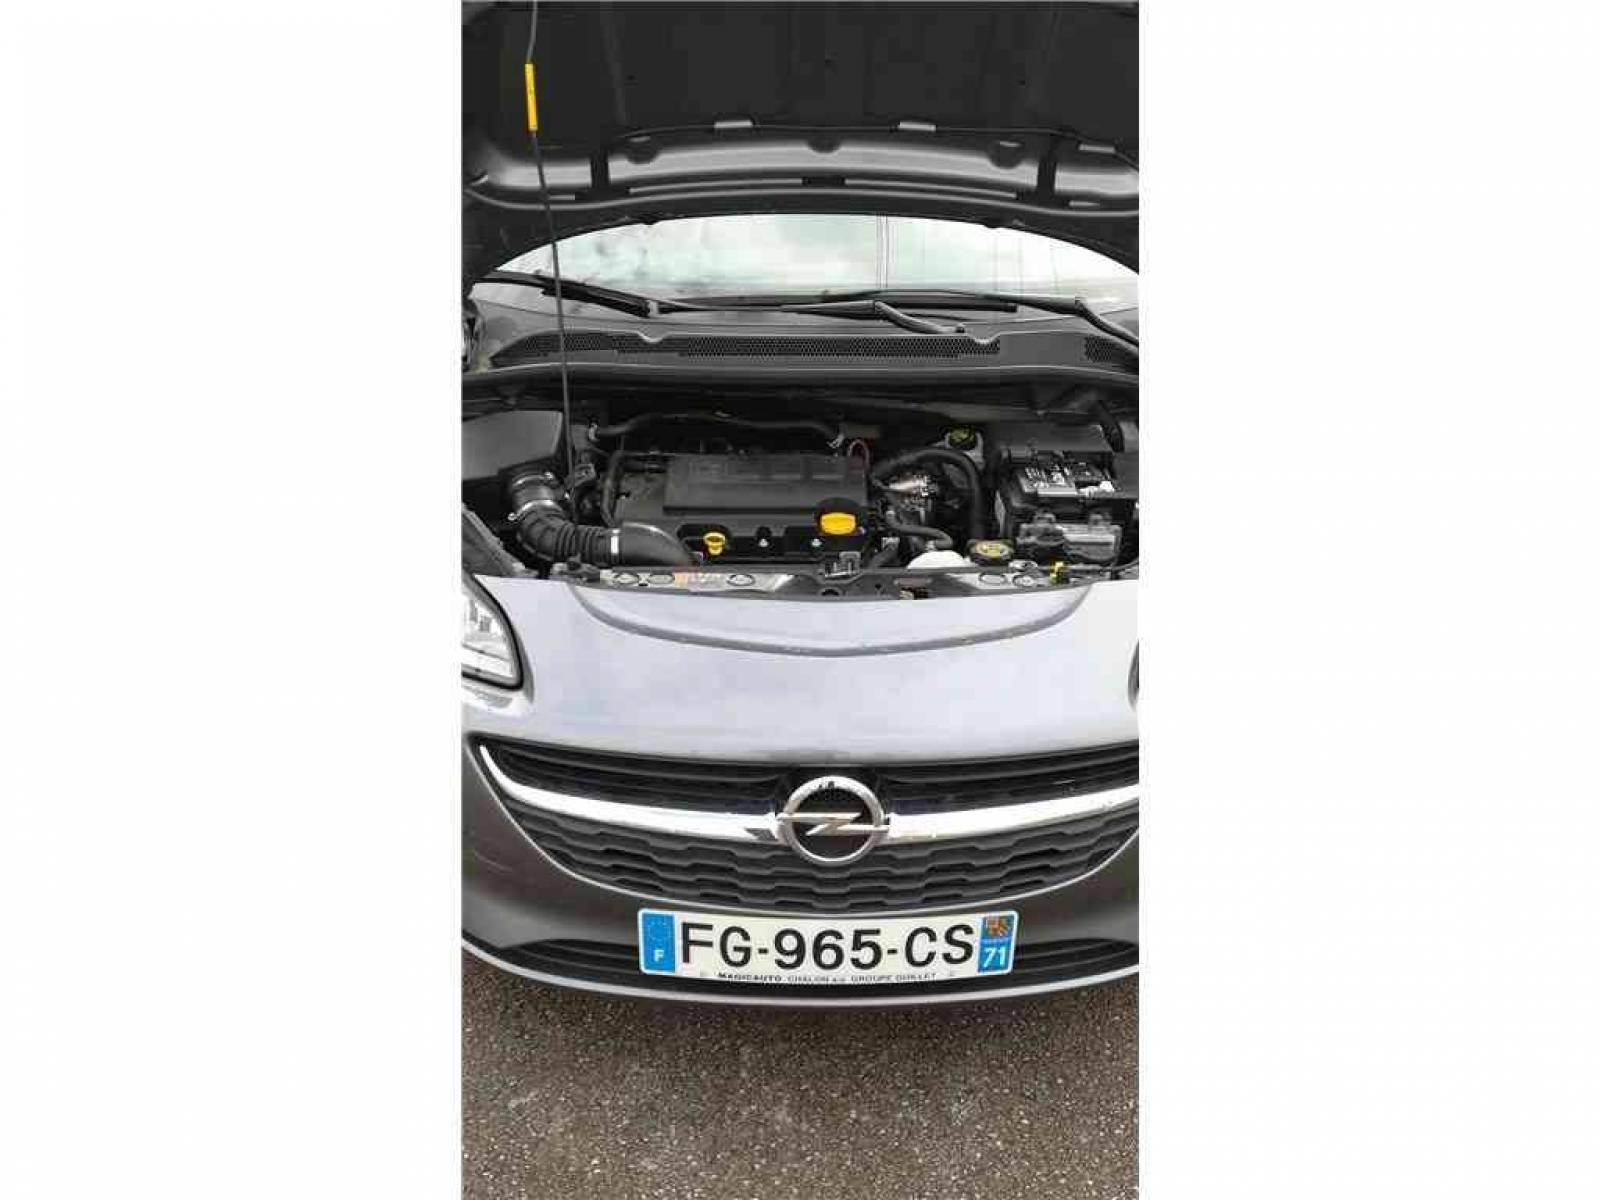 OPEL Corsa 1.4 Turbo 100 ch - véhicule d'occasion - Groupe Guillet - Opel Magicauto - Chalon-sur-Saône - 71380 - Saint-Marcel - 22